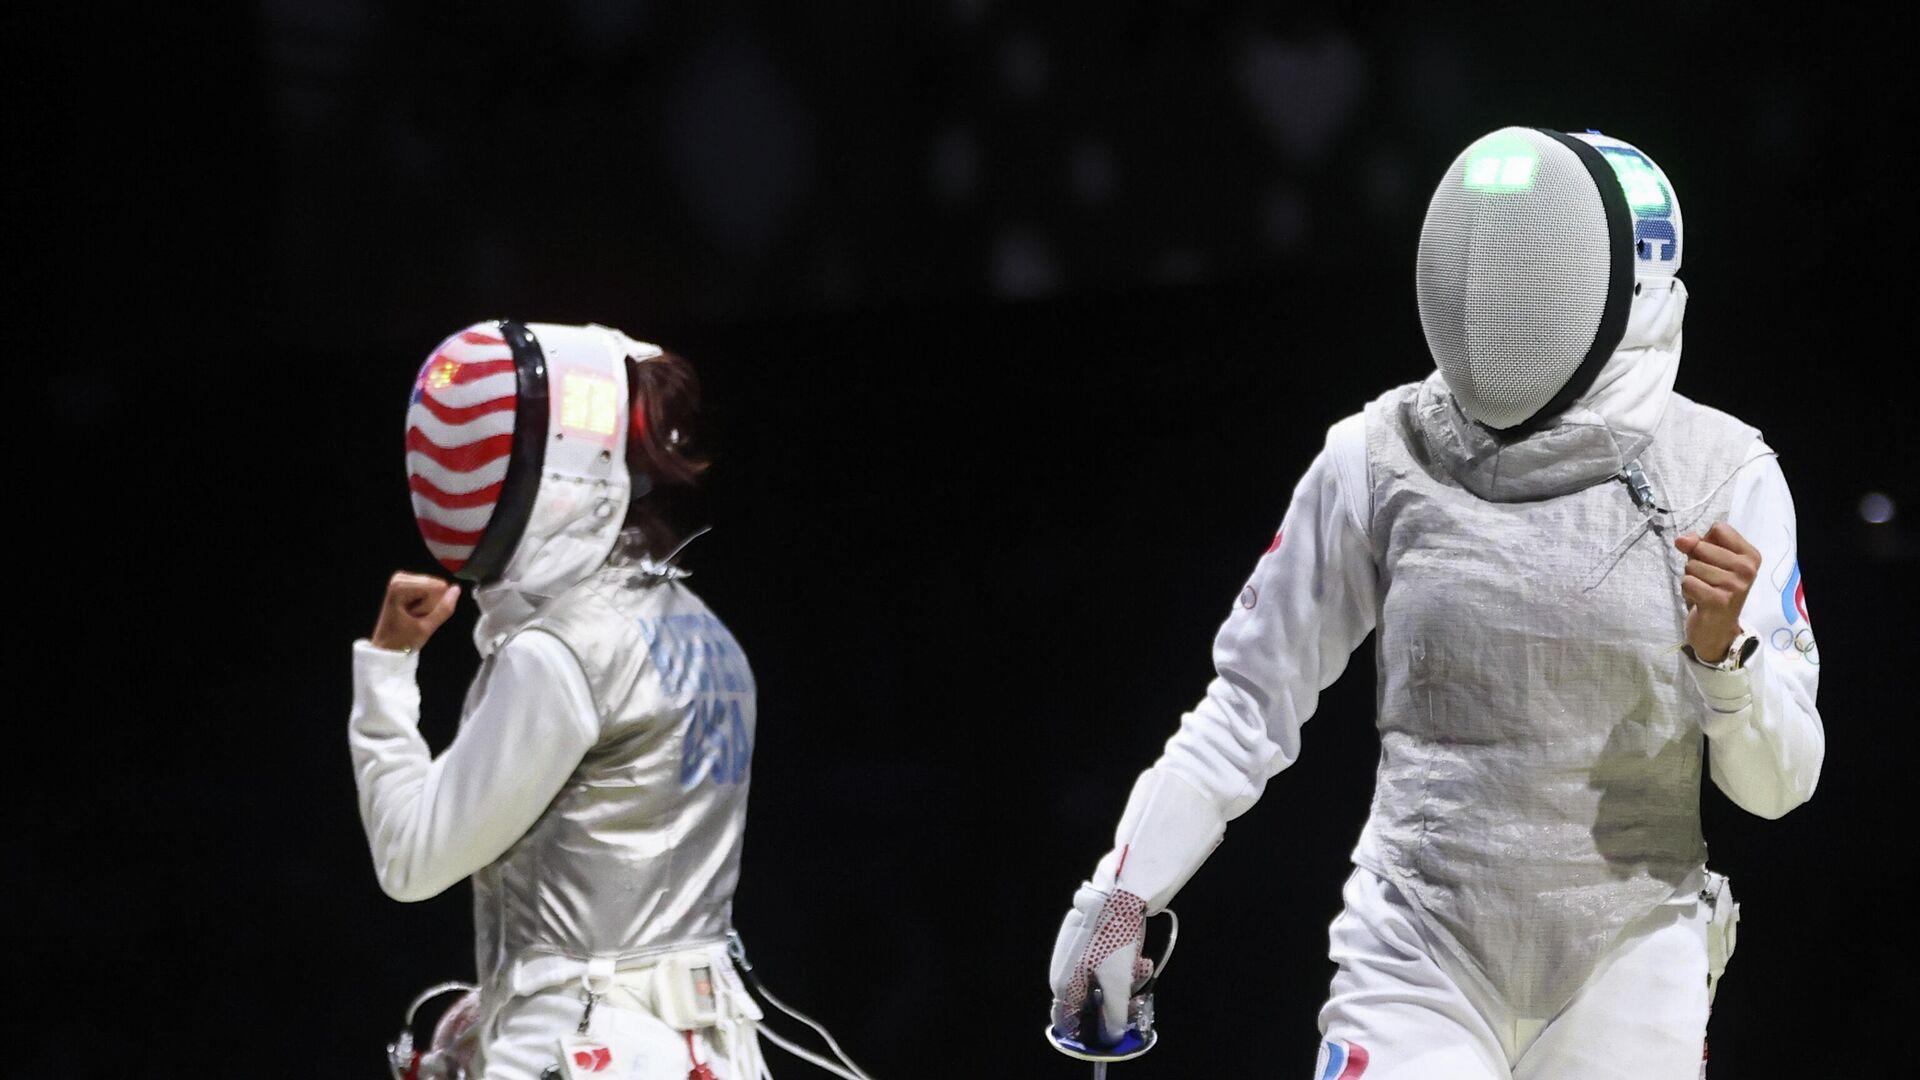 Российская рапиристка Аделина Загитуллина (справа) на Олимпийских играх в Токио - РИА Новости, 1920, 29.07.2021